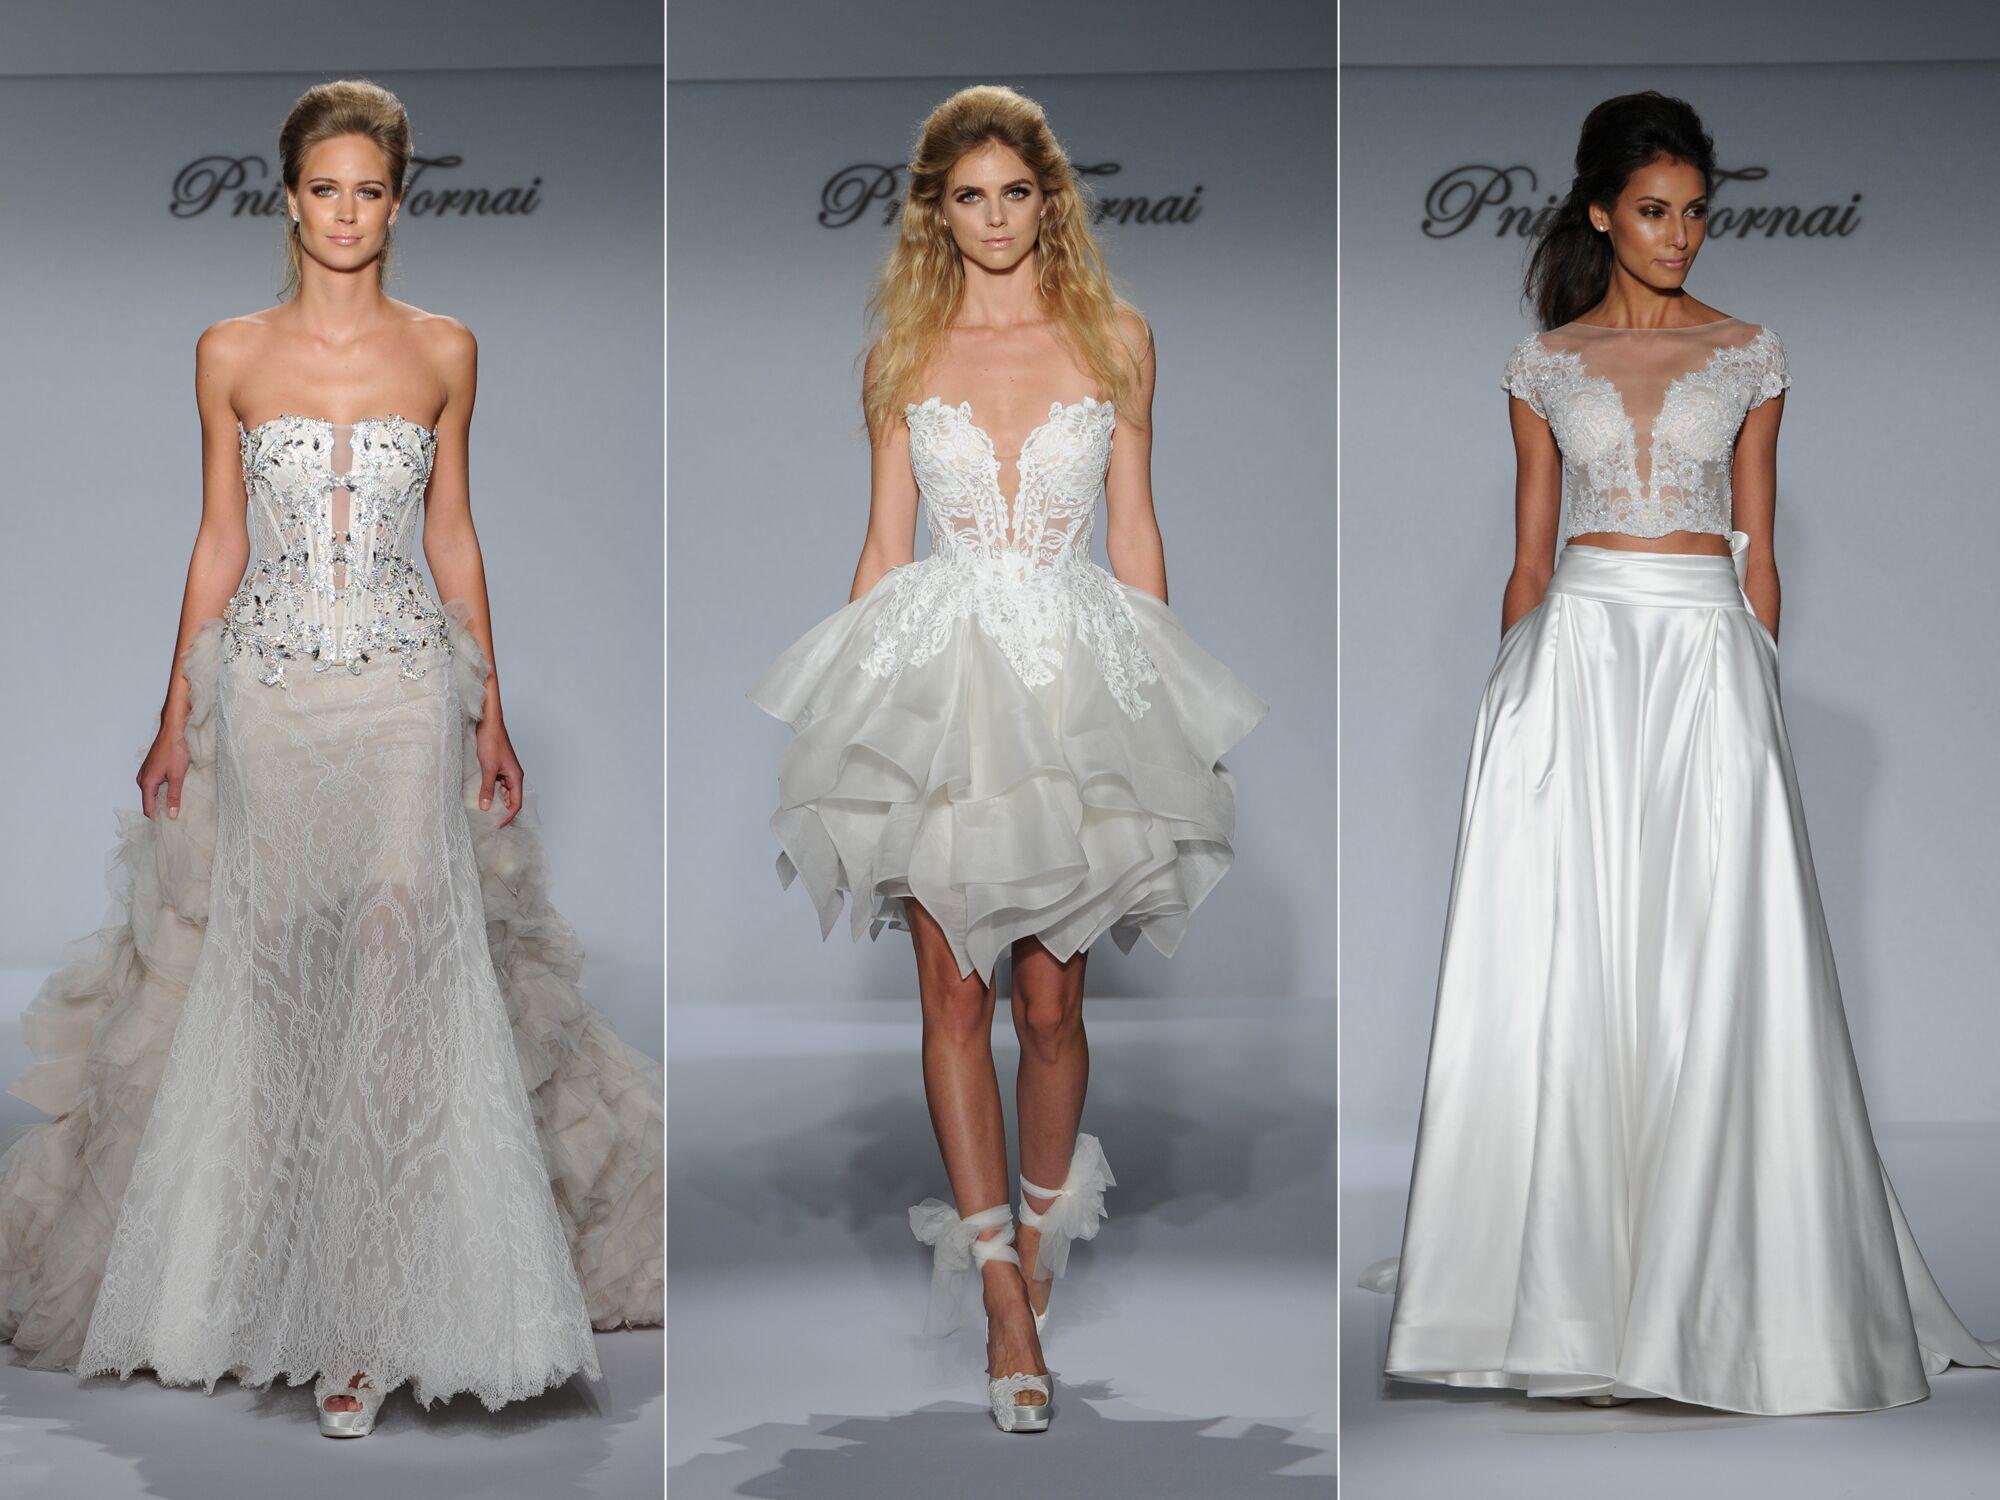 Panini Wedding Dress – fashion dresses